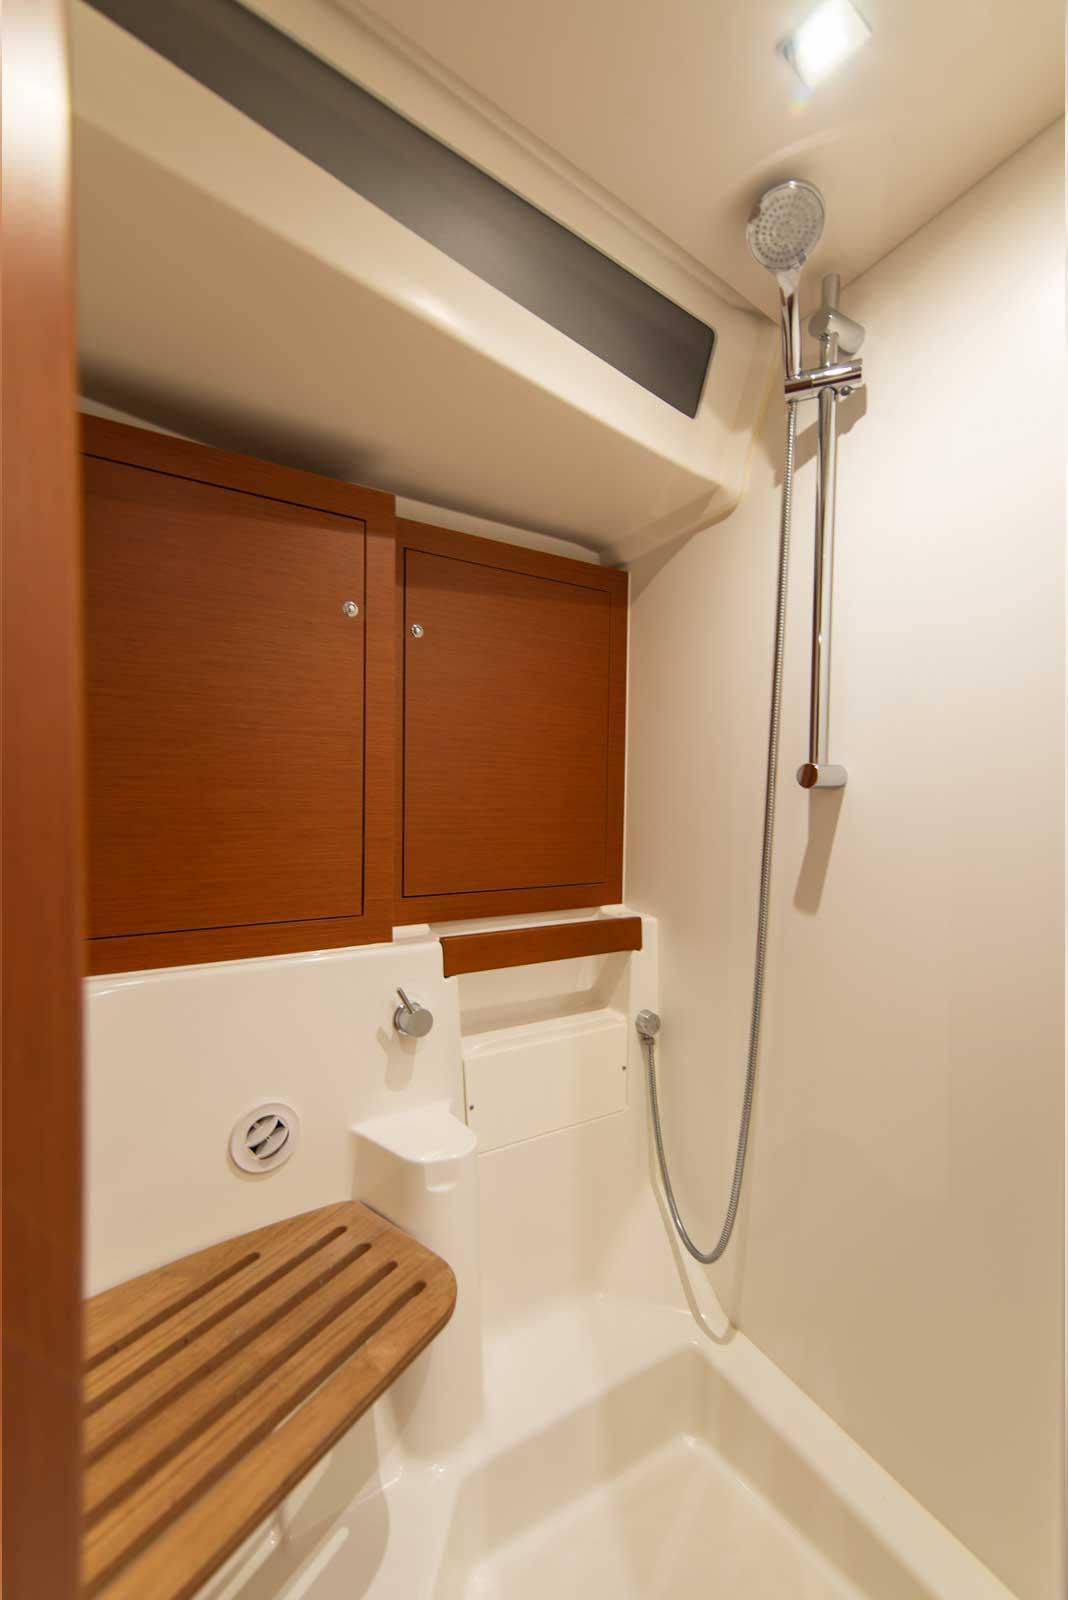 Beneteau-Oceanis-51.1-shower